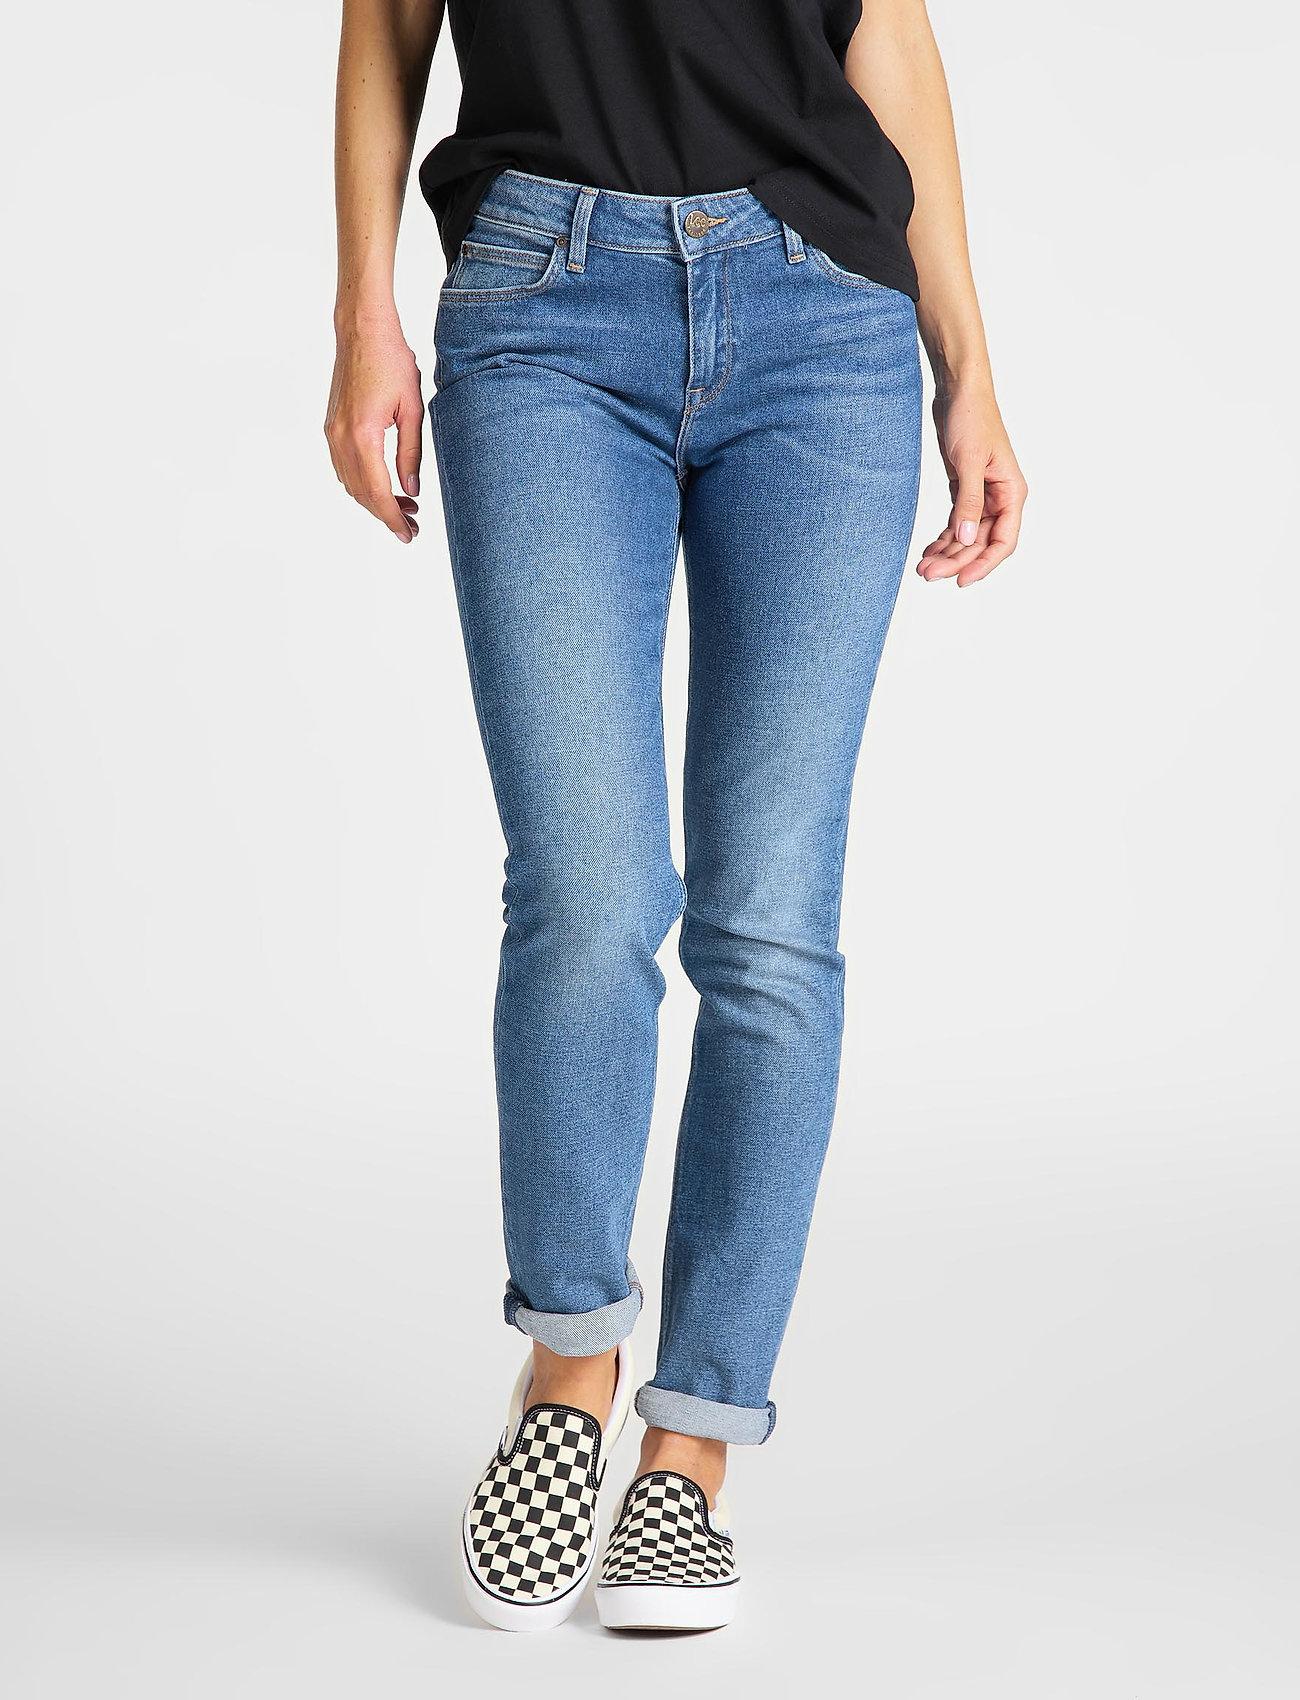 Lee Jeans - ELLY - slim jeans - mid hackett - 0